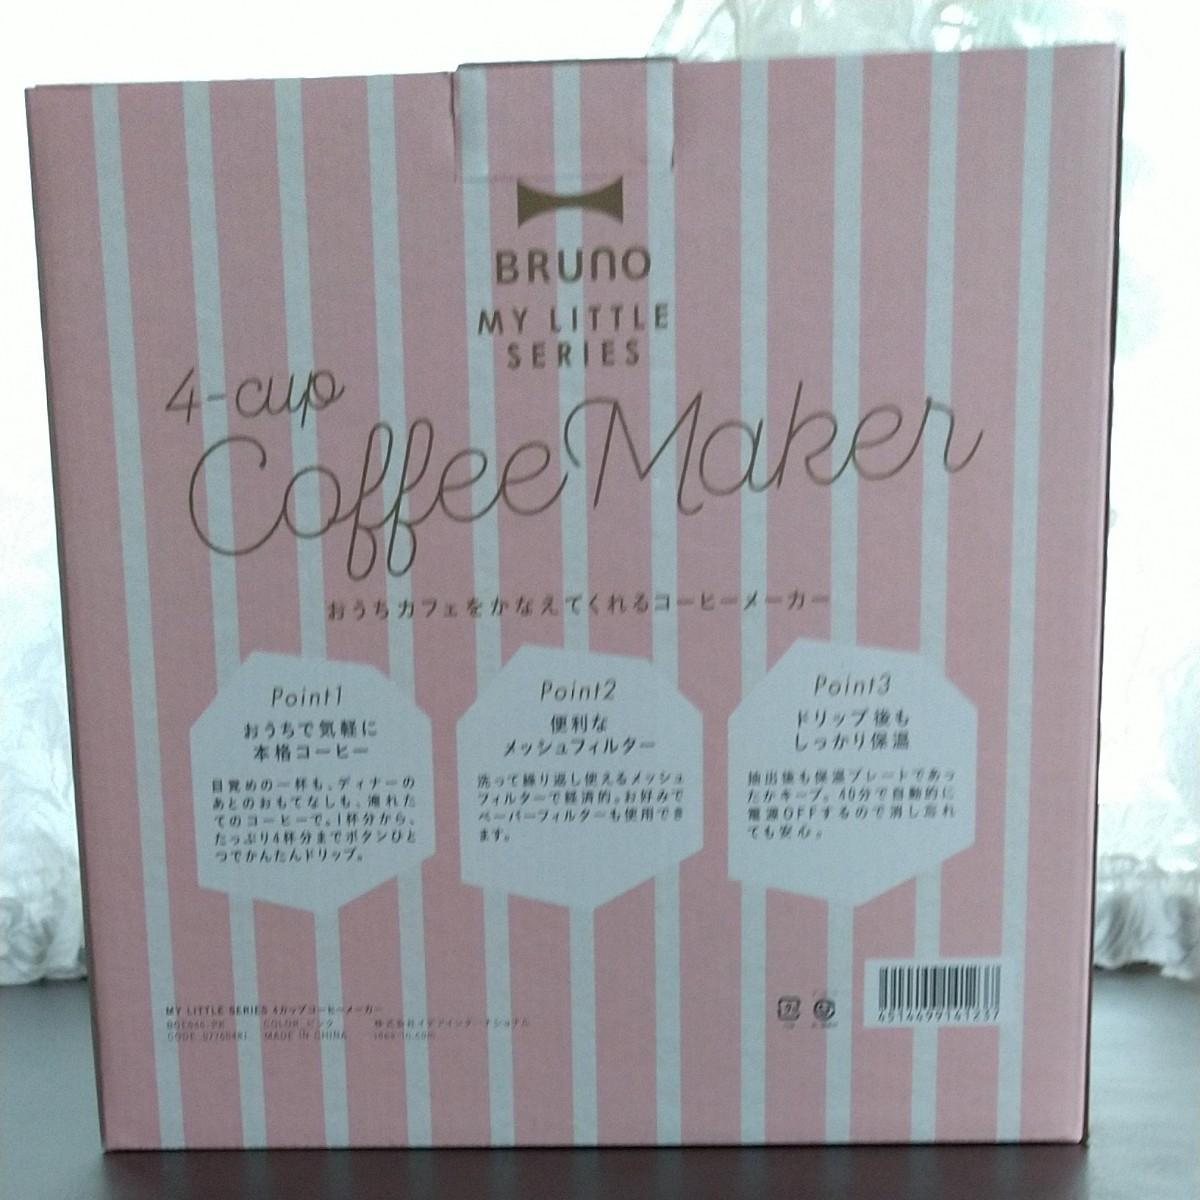 BRUNOコーヒーメーカー